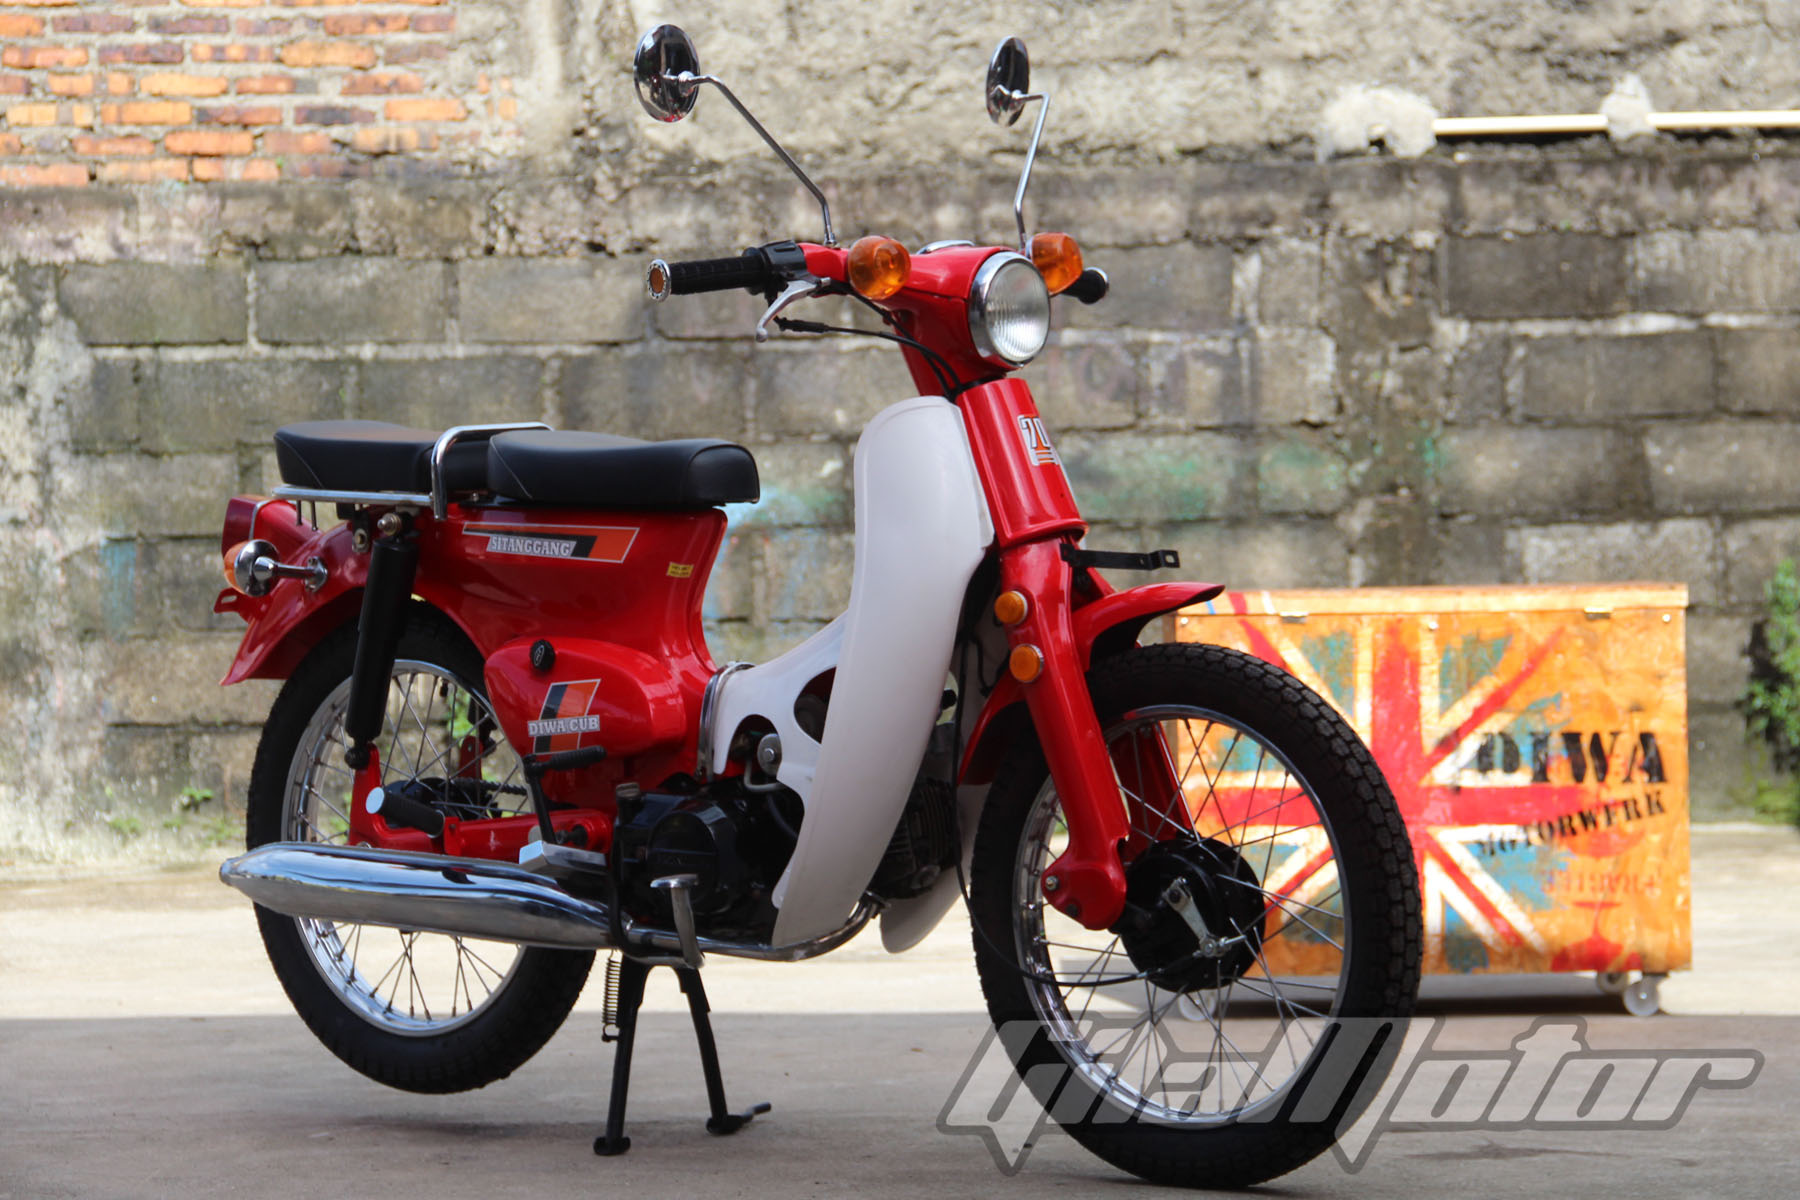 Modifikasi Honda Astrea Grand Jadi Makin Tua Gilamotor